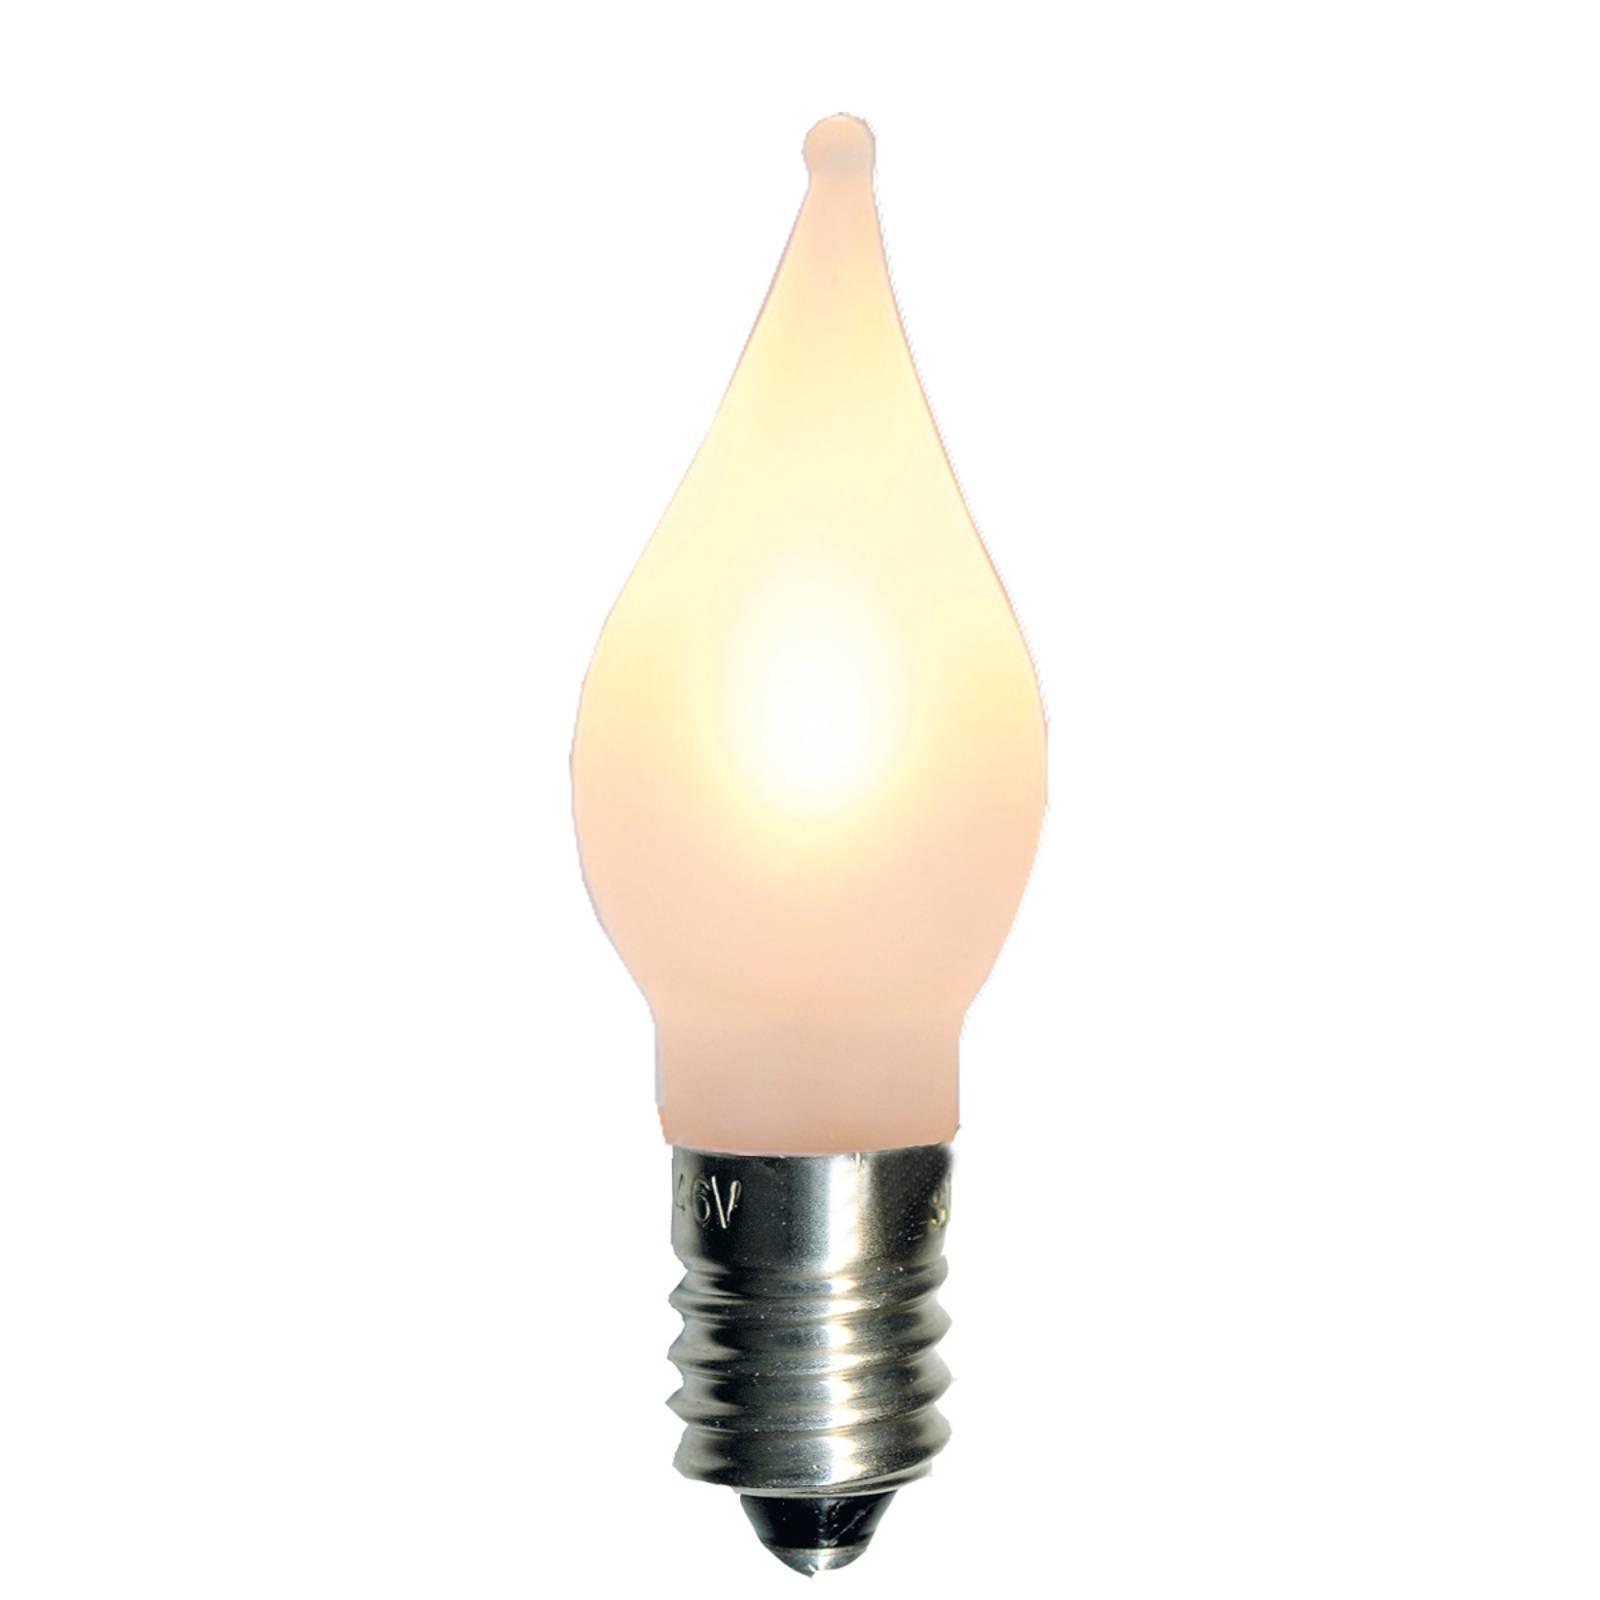 E10 0,1W 10-55V LED set 3x ricambi a fiammella